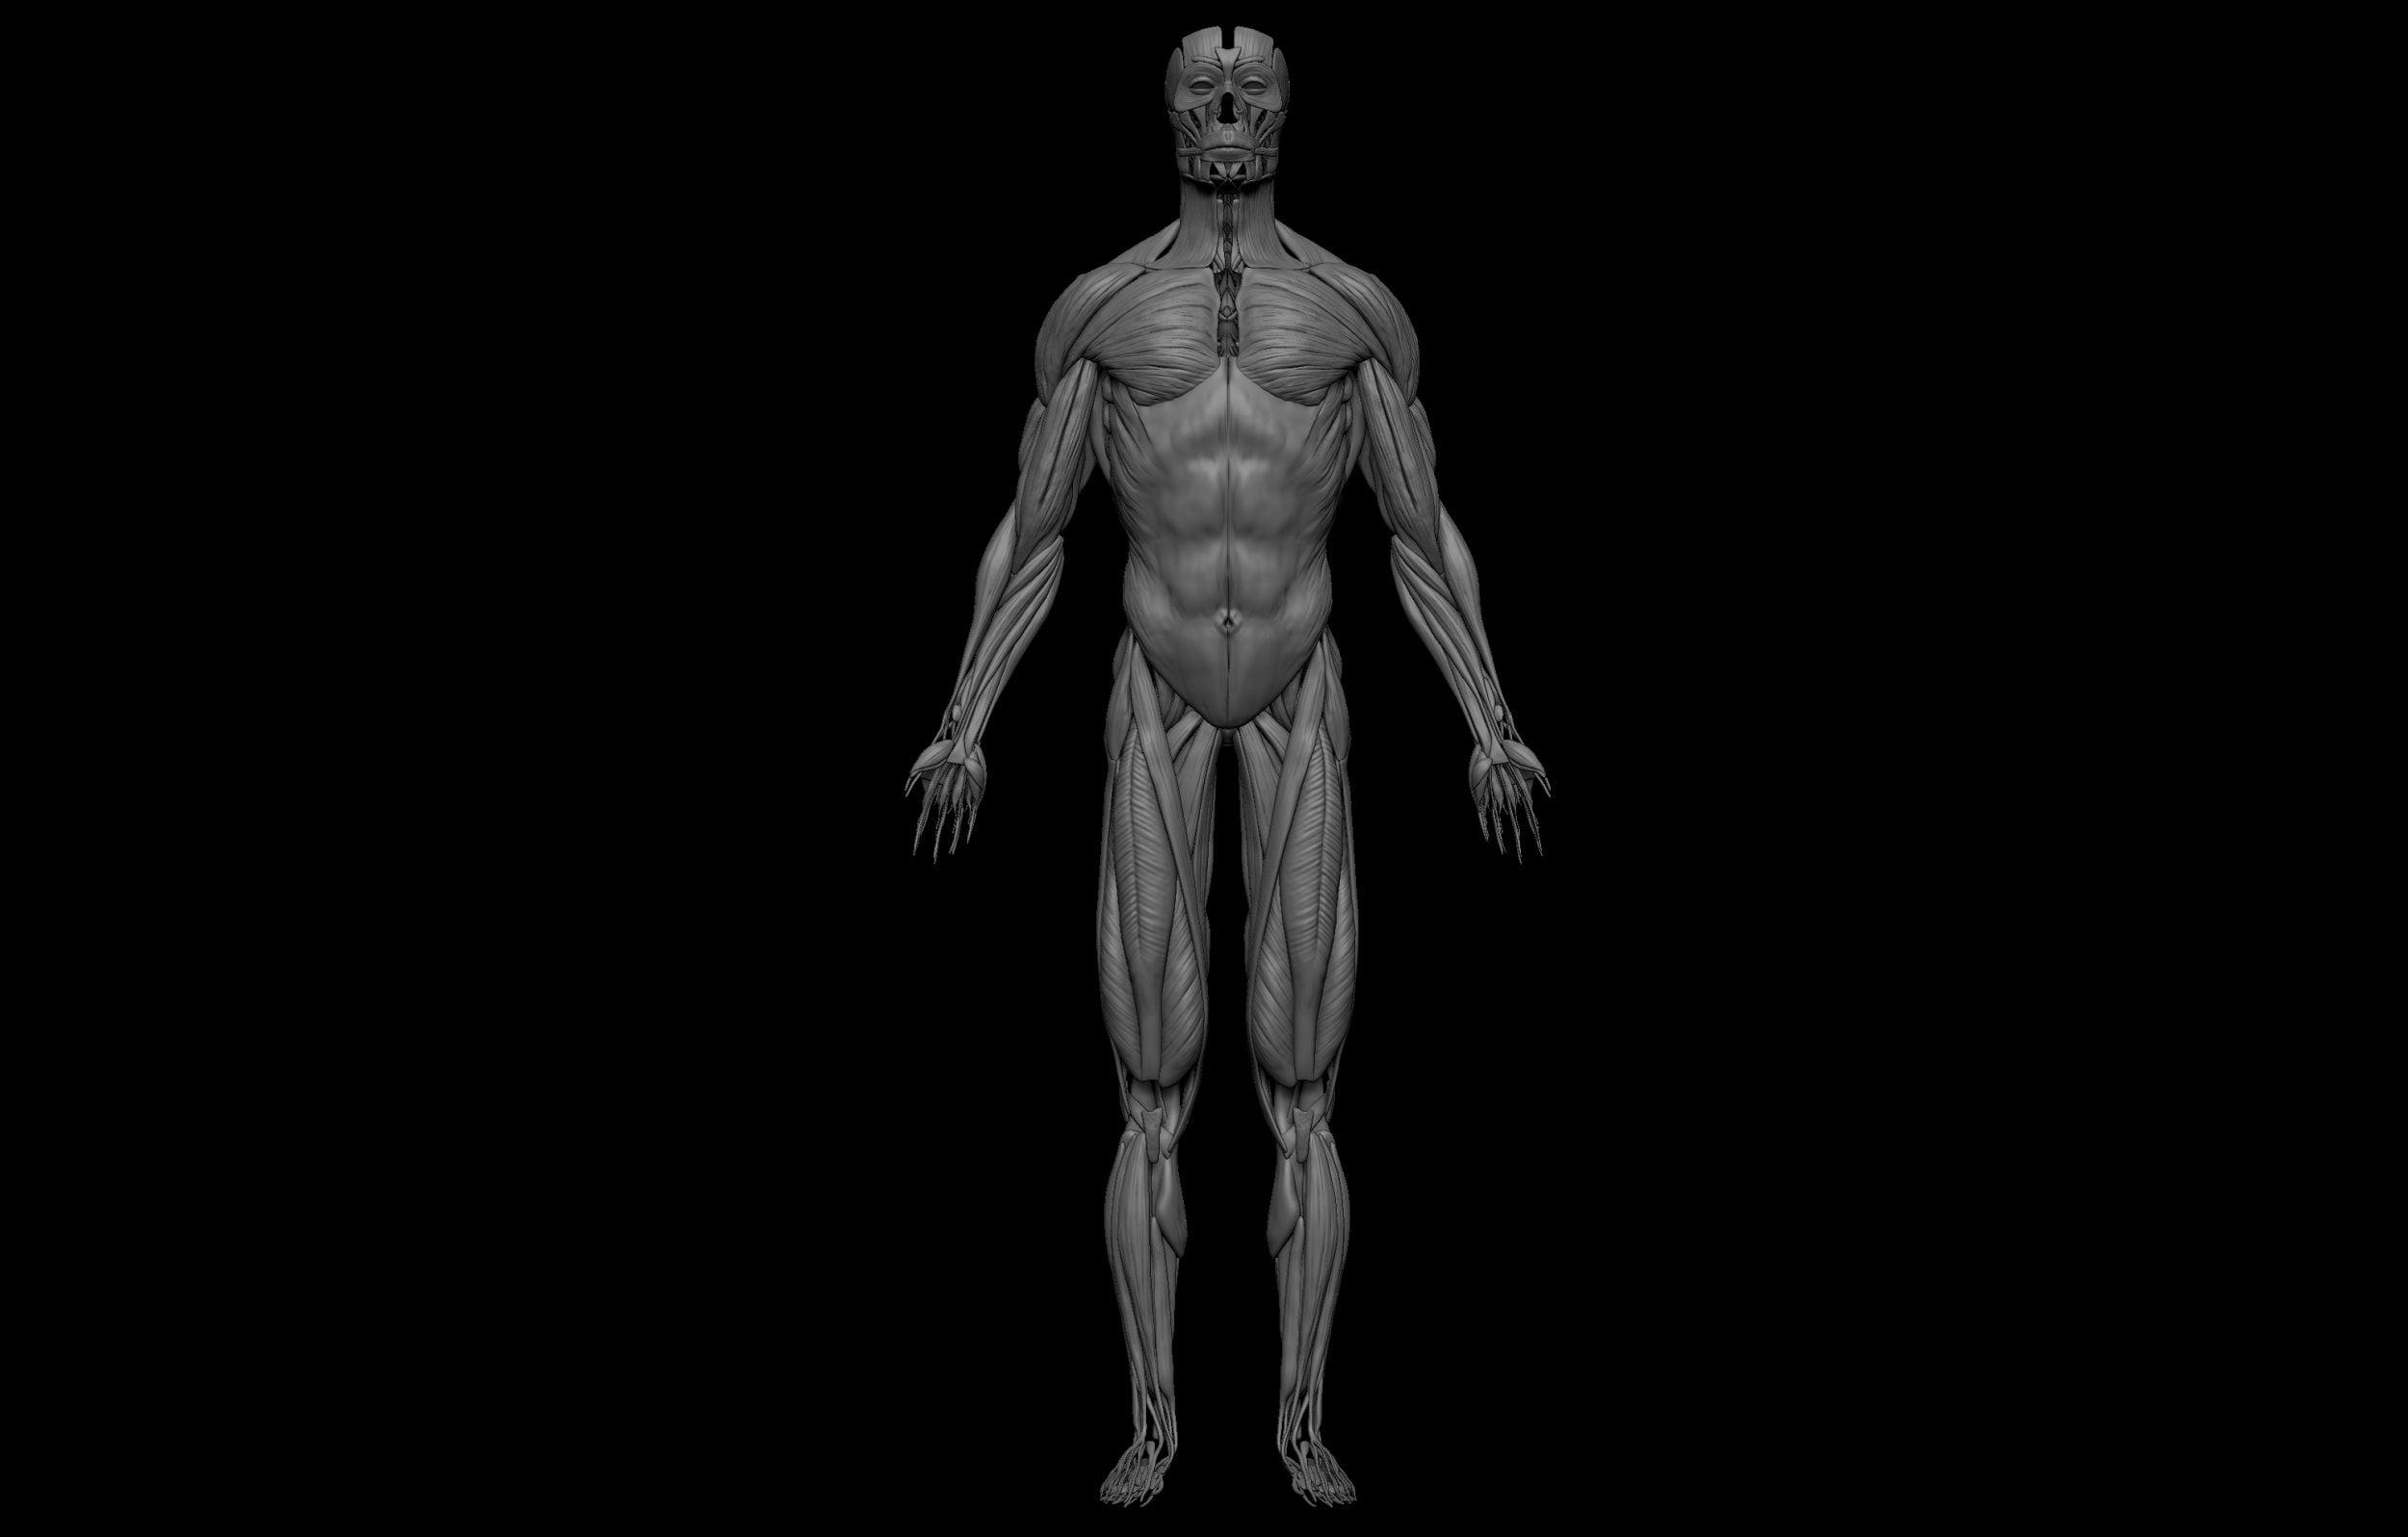 8 3 scaled SA Anatomy   Study Anatomy in 3D